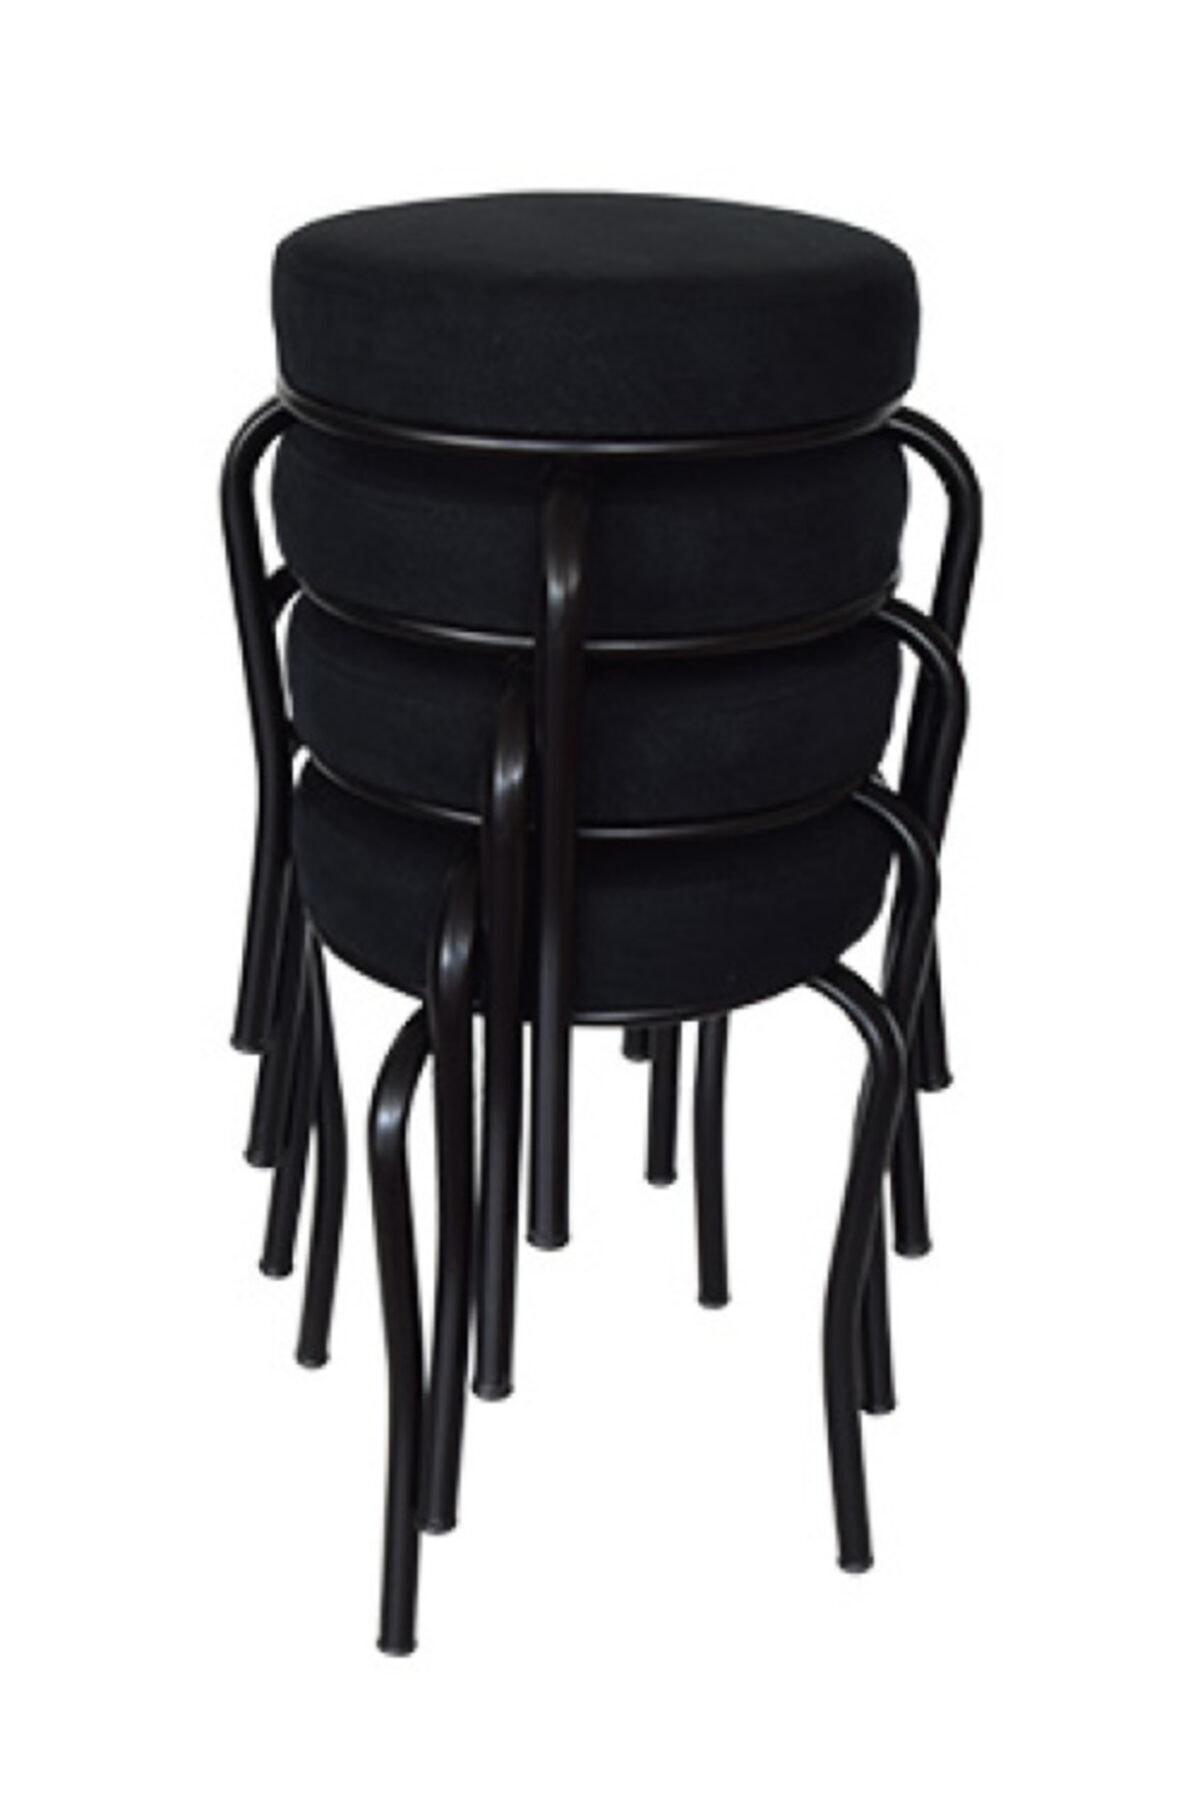 Tabure (4 Adet) Siyah Ayaklı, Taytüyü Kumaş, Metal Ahtapot, Mutfak Balkon Işyeri Hr T 102